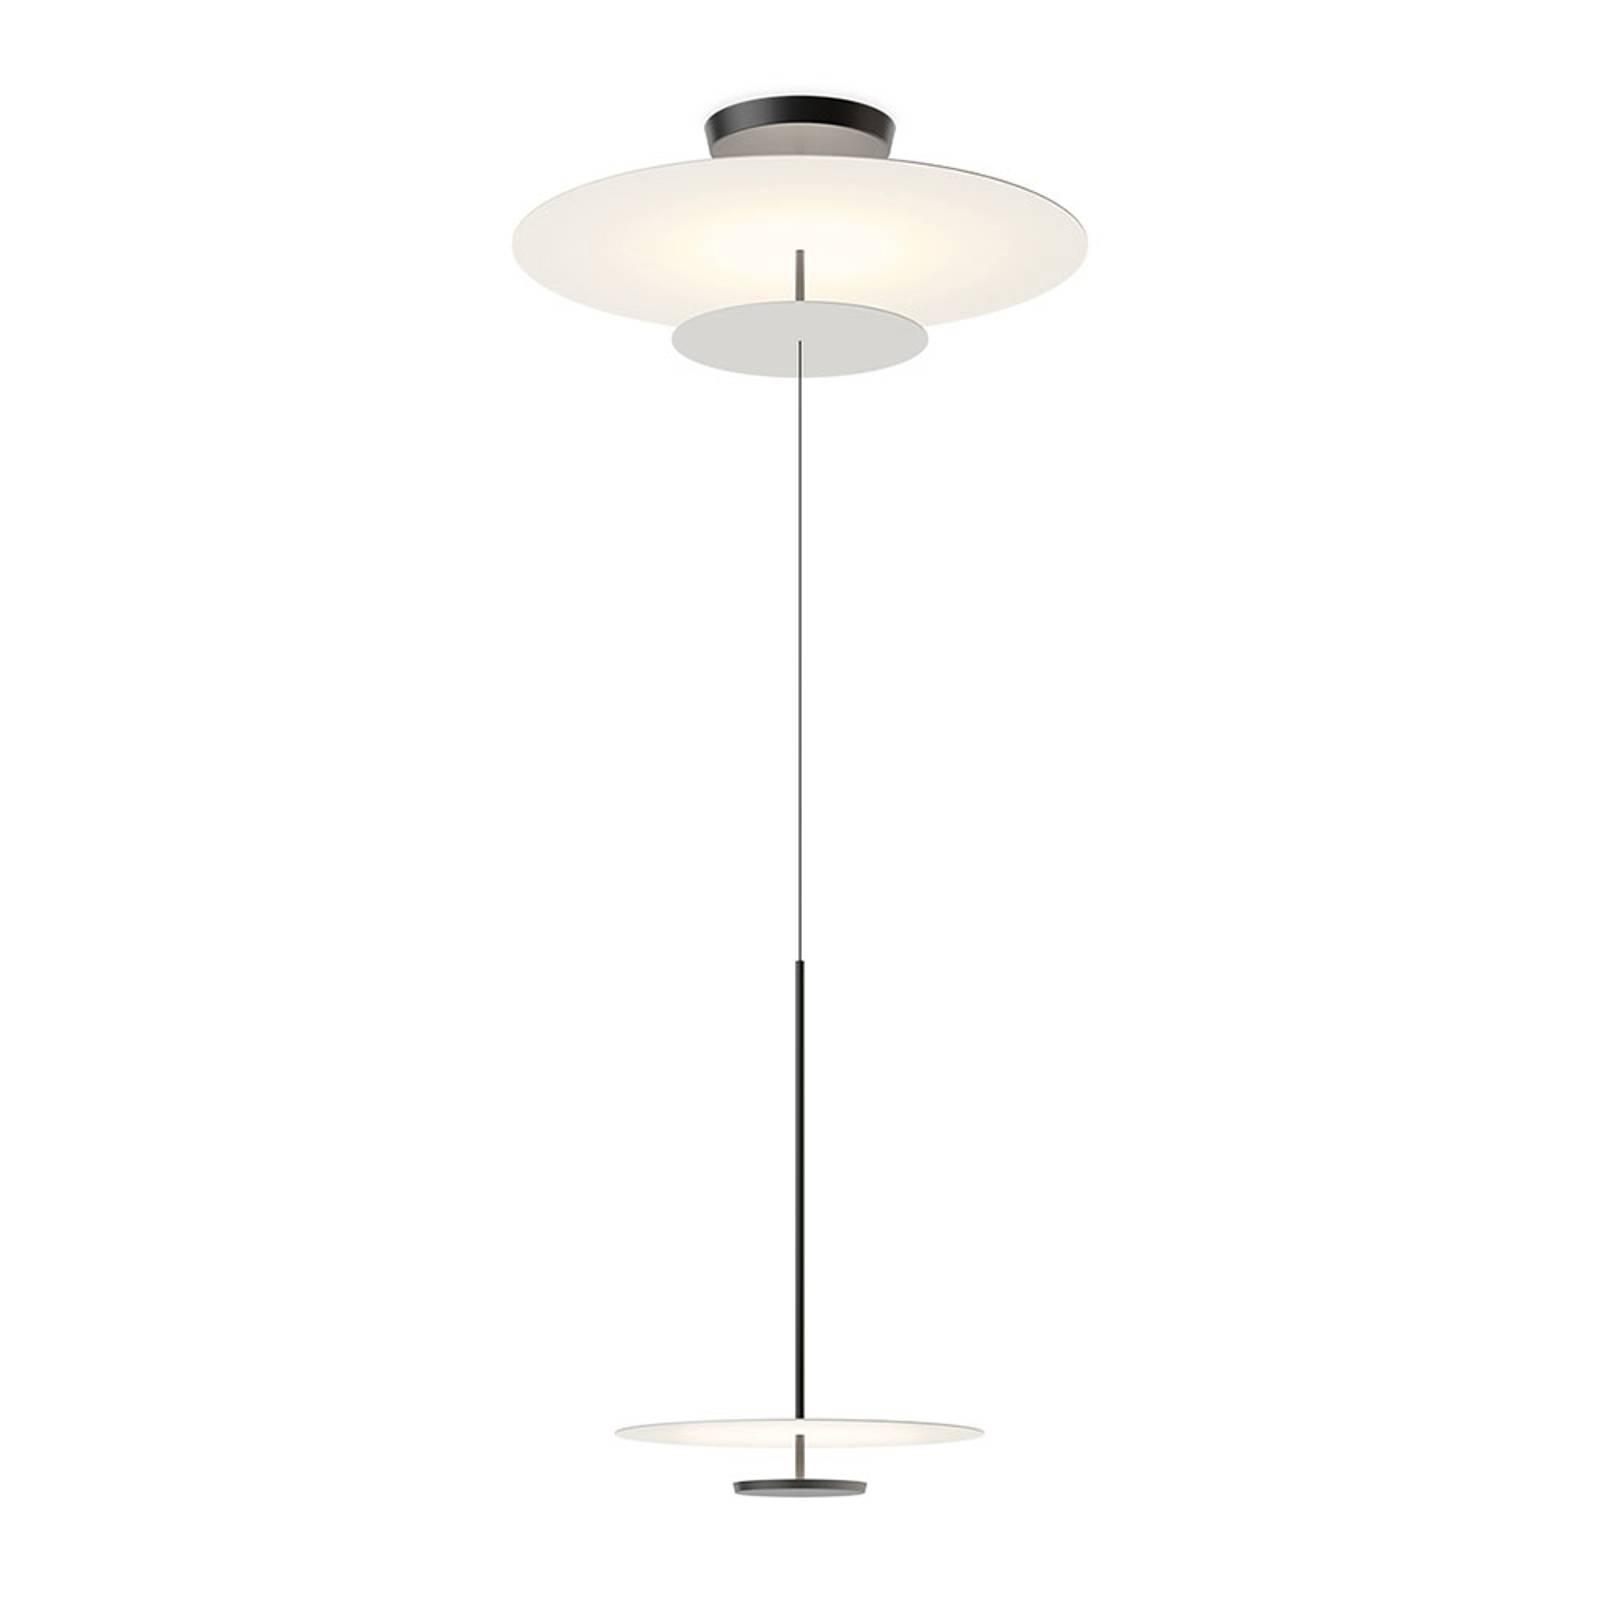 Vibia Flat suspension LED 3 lampes Ø 90cm grise L1